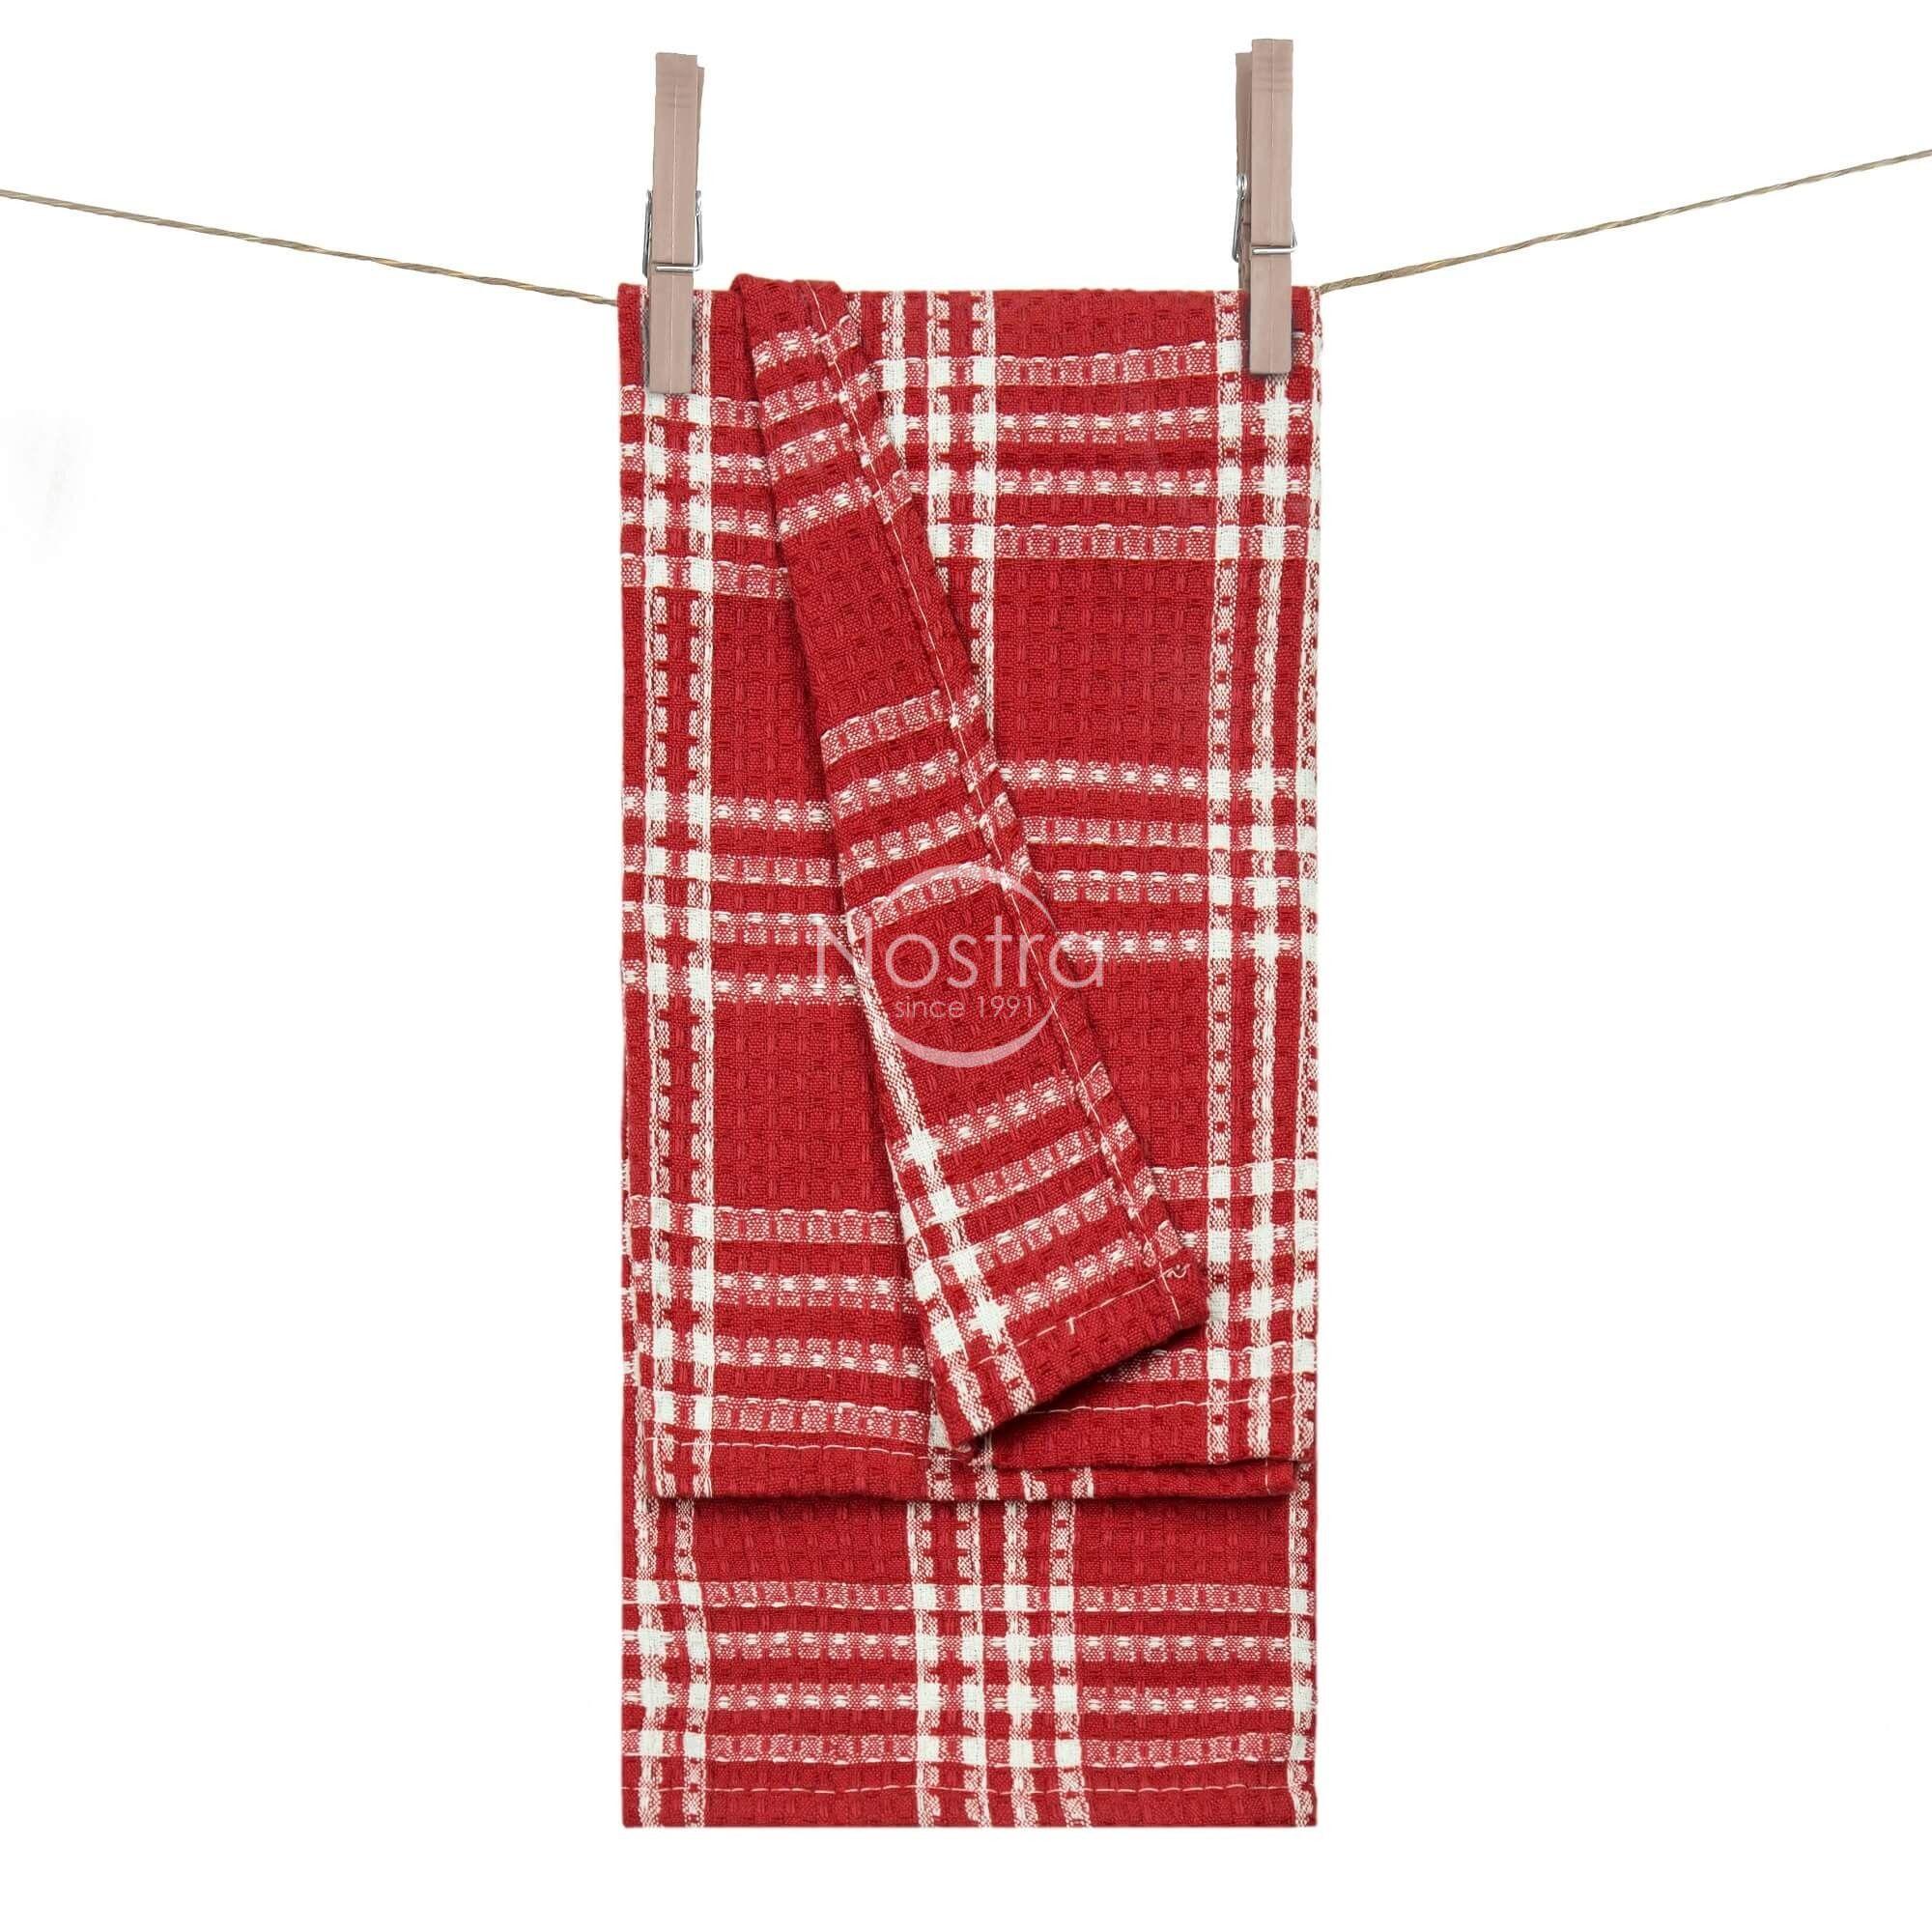 Virtuvinis rankšluostis WAFEL-240 T0101-RED 50x70 cm